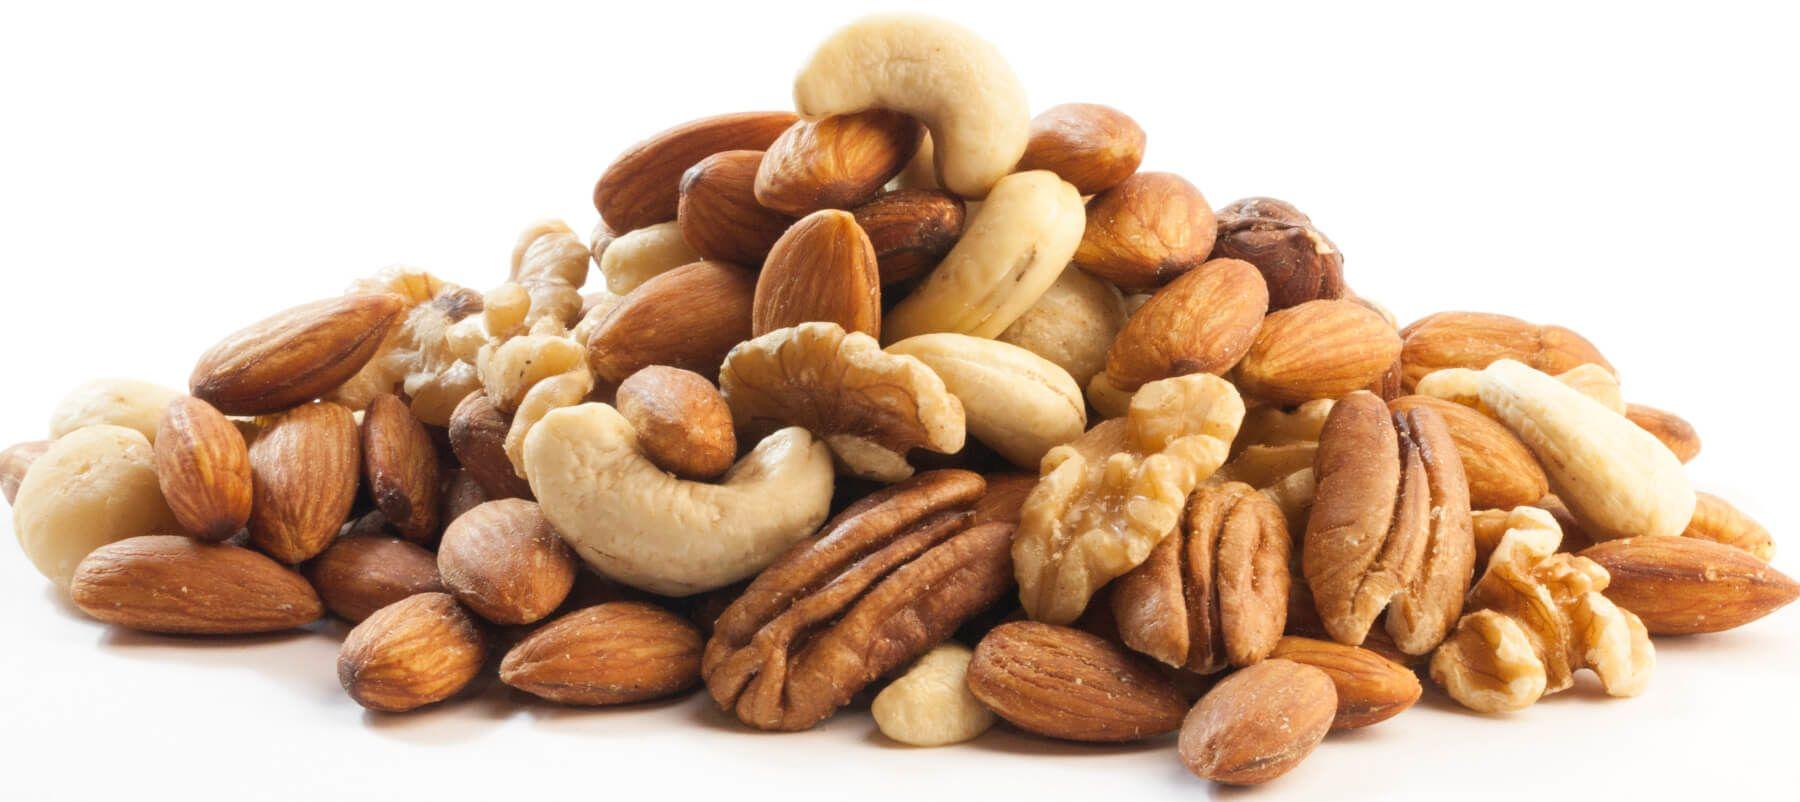 Cara Aman Mengenalkan Kacang-kacangan Makanan Anak